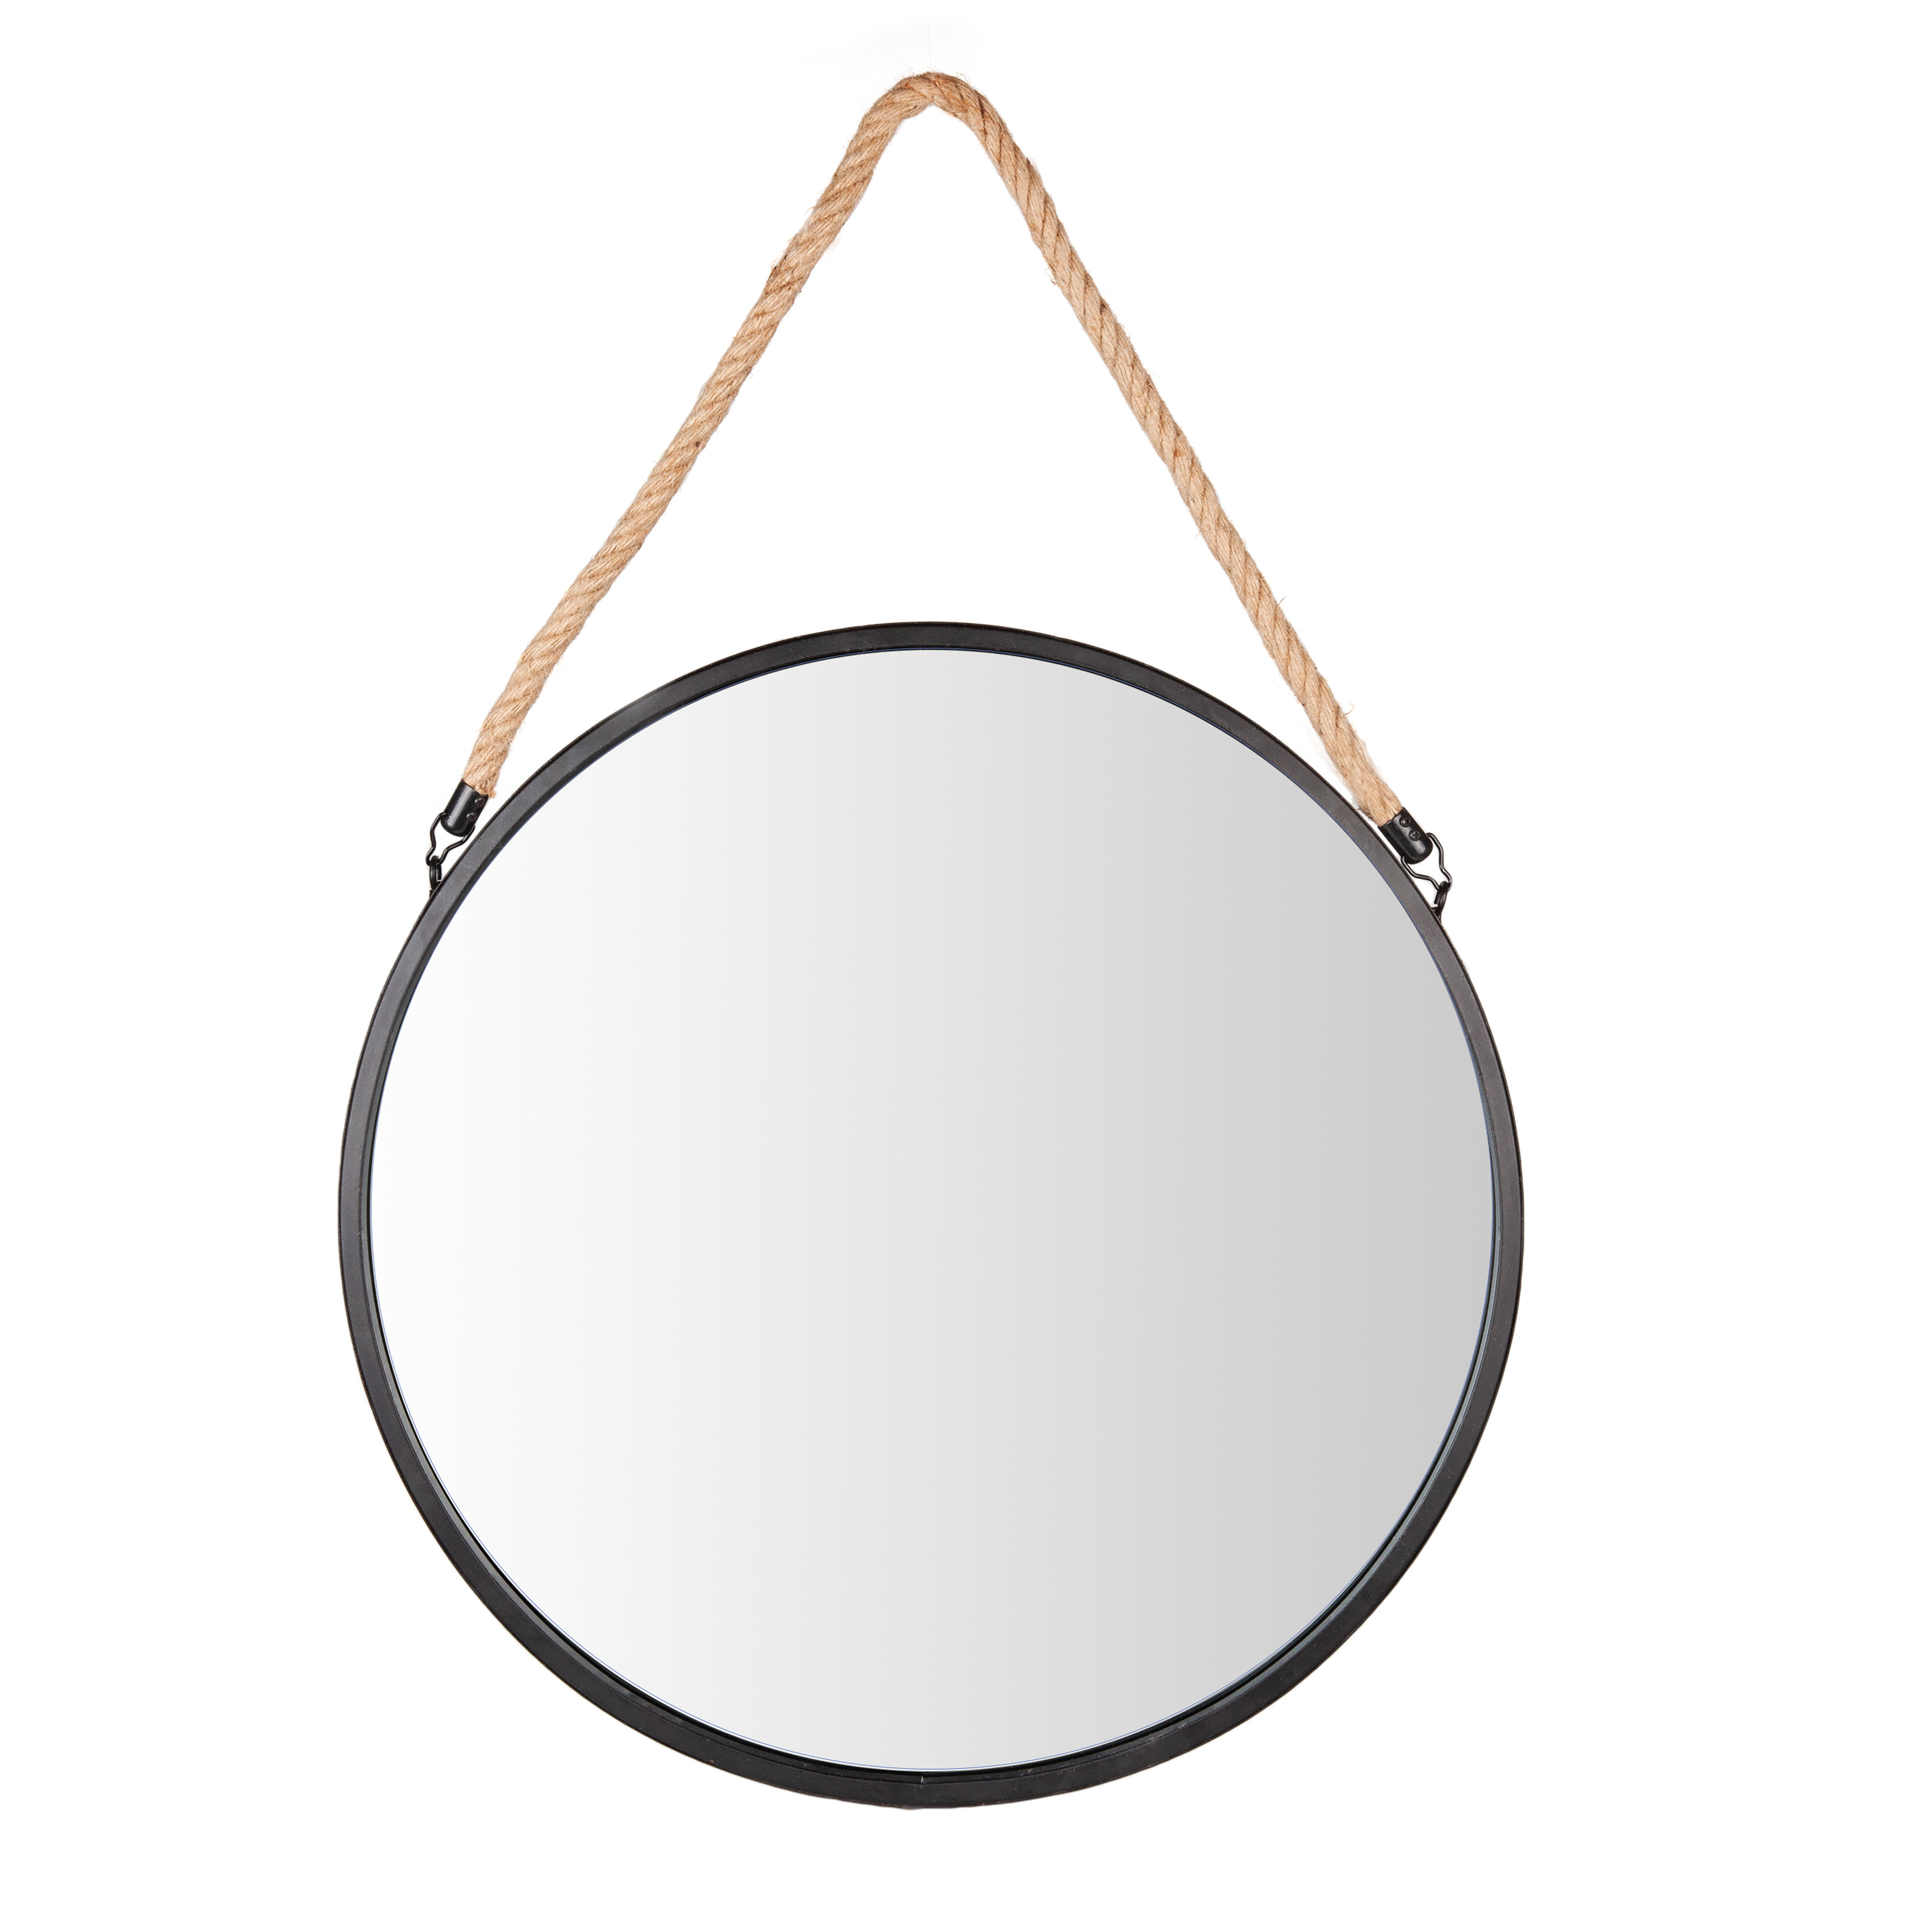 Rumfelt Decorative Round Metal Wall Mirror With Regard To Newest Decorative Round Wall Mirrors (View 20 of 20)